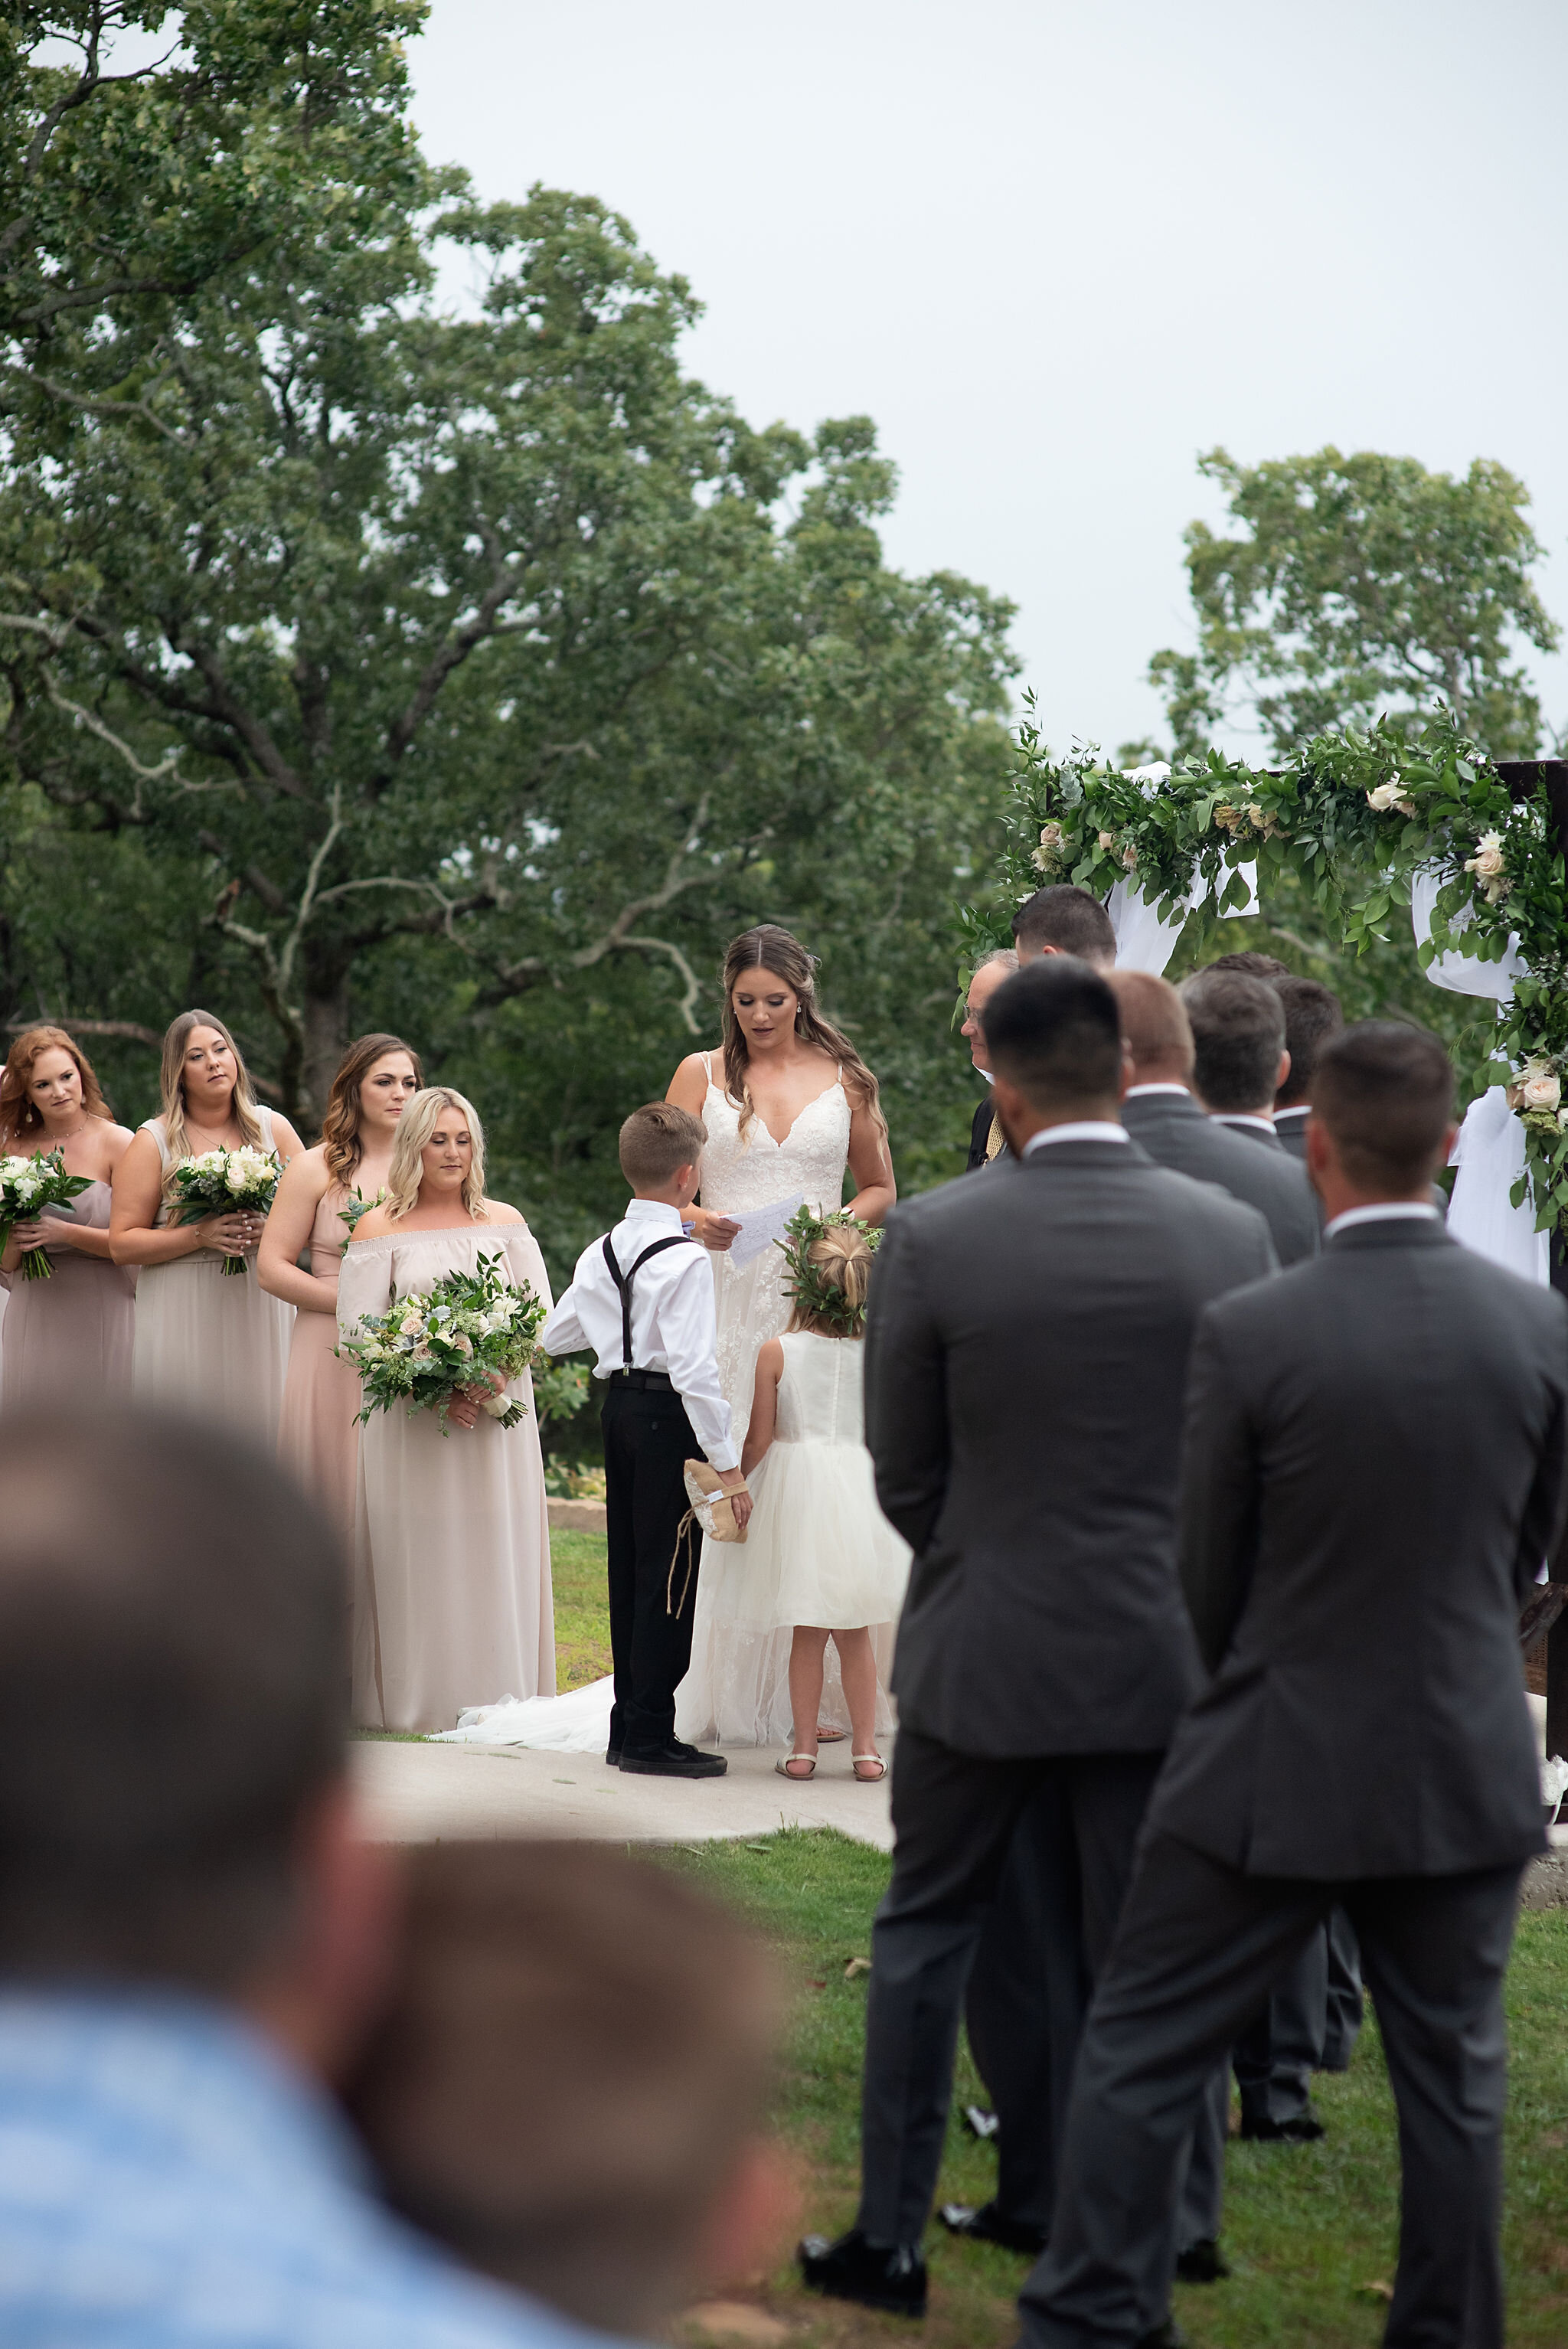 Oklahoma Summer Wedding Venue Dream Point Ranch 30.jpg